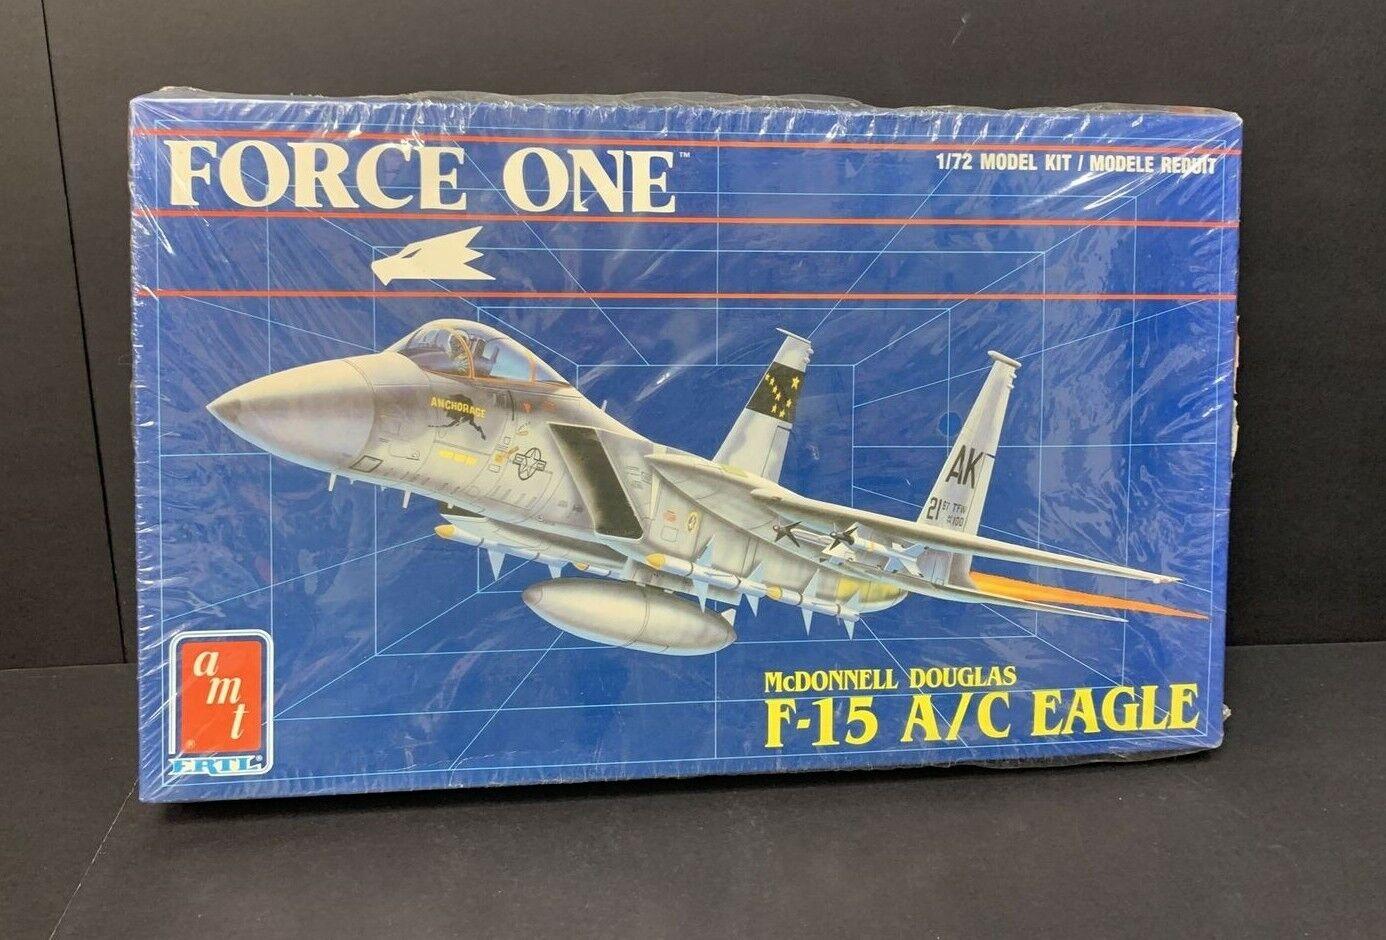 Mcdonnell douglas f 15 mini skirts Toys Hobbies Amt 8694 1 72 Force One Mcdonnell Douglas F 15 A C Eagle Airplane Kit 1990 For Sale Online Models Kits